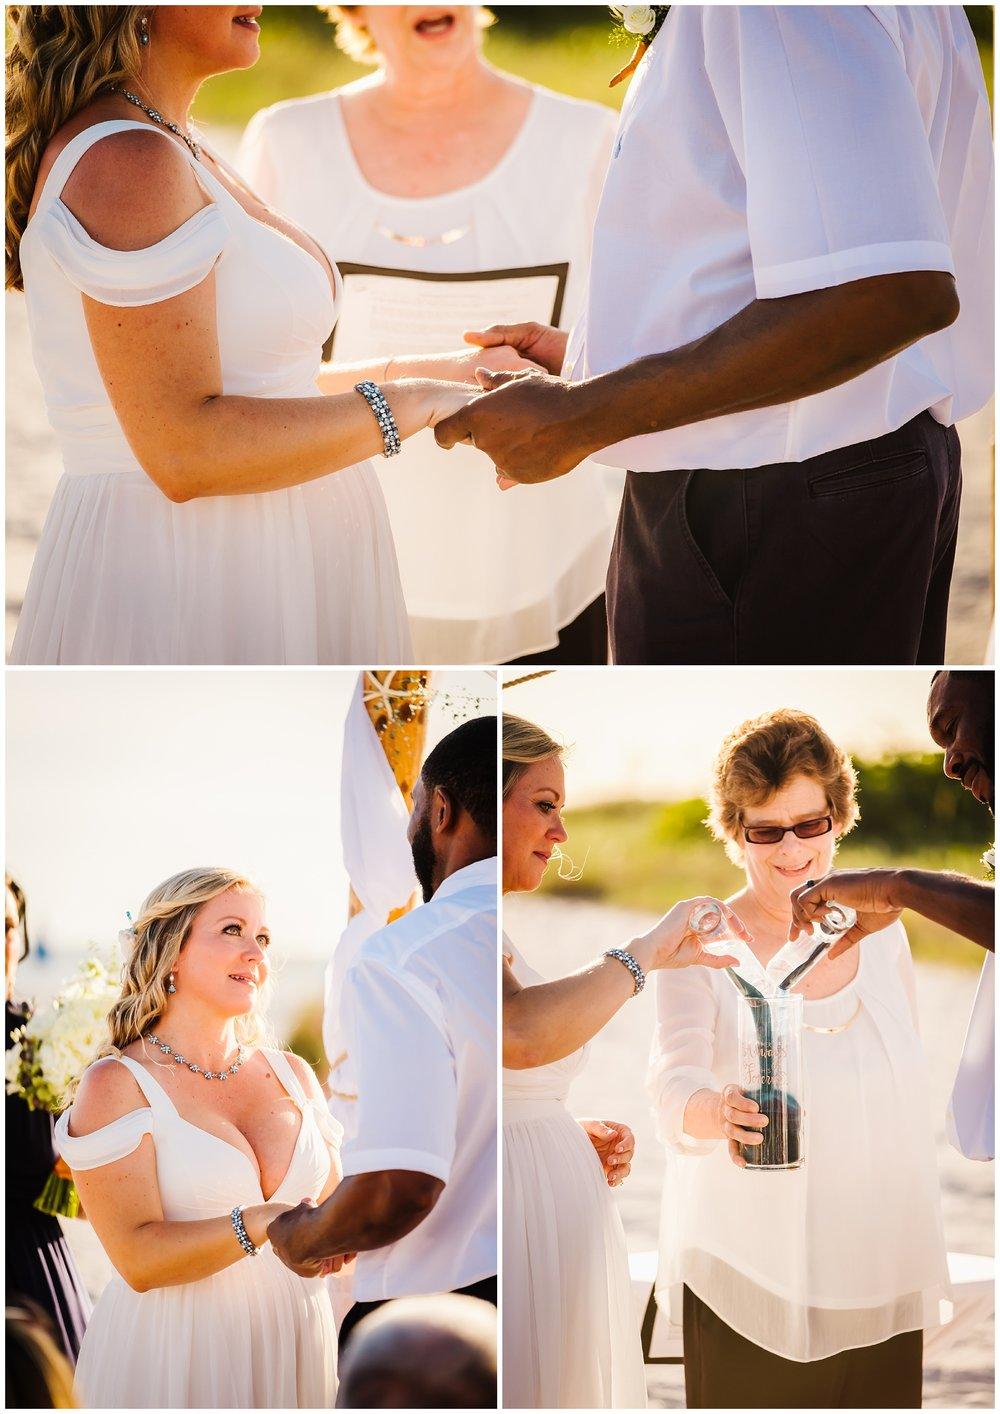 post-card-inn-wedding-photographer-twins-beach-bubbles_0015.jpg